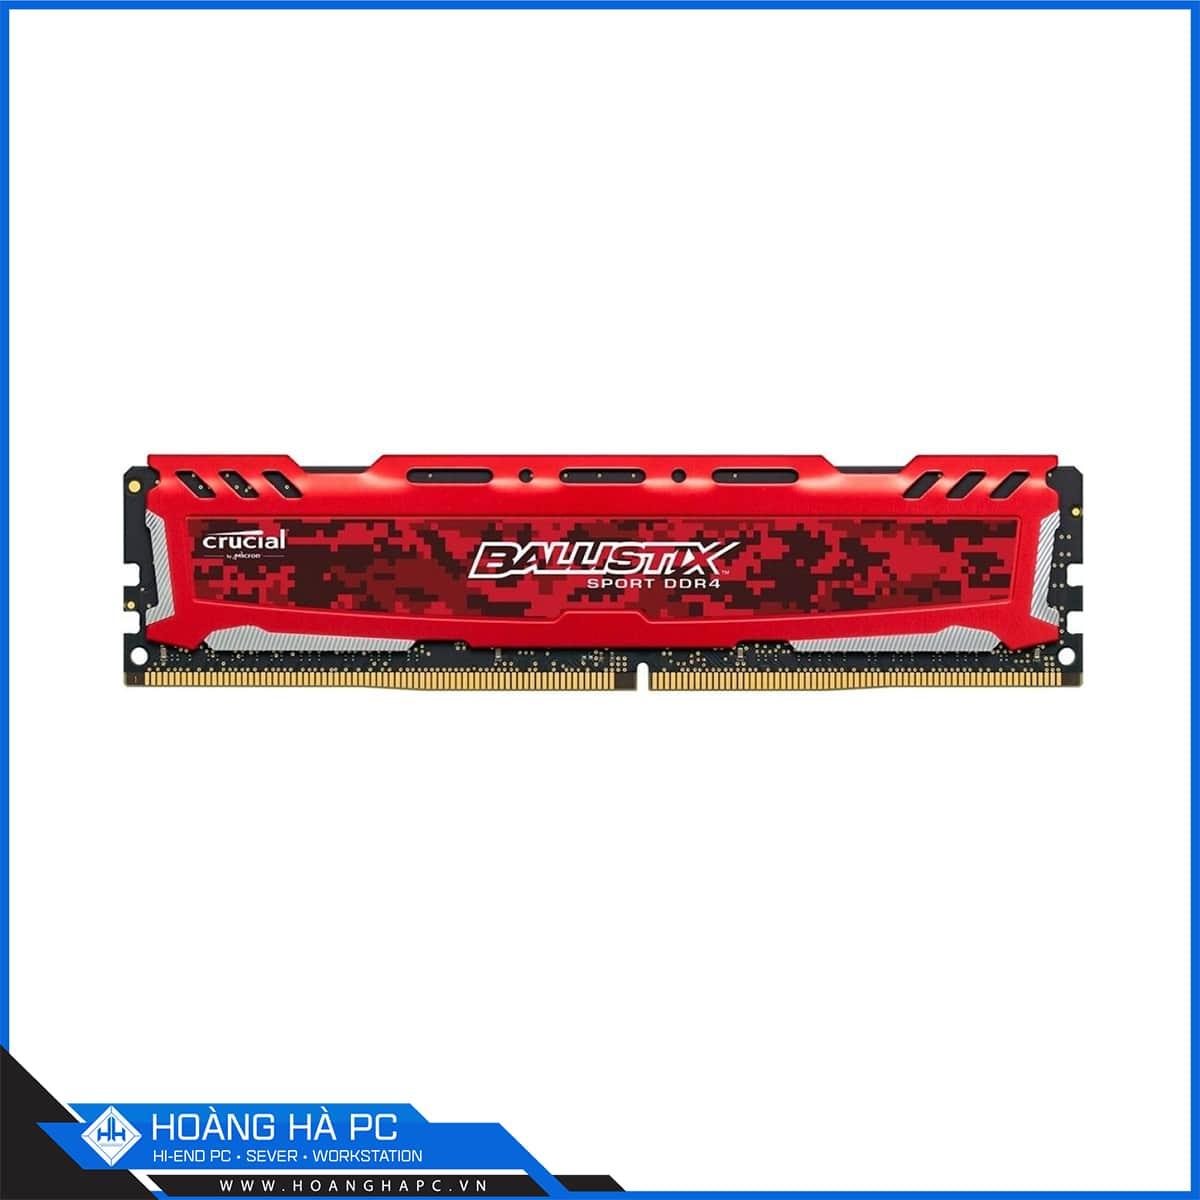 RAM Crucial Ballistix Sport 8GB